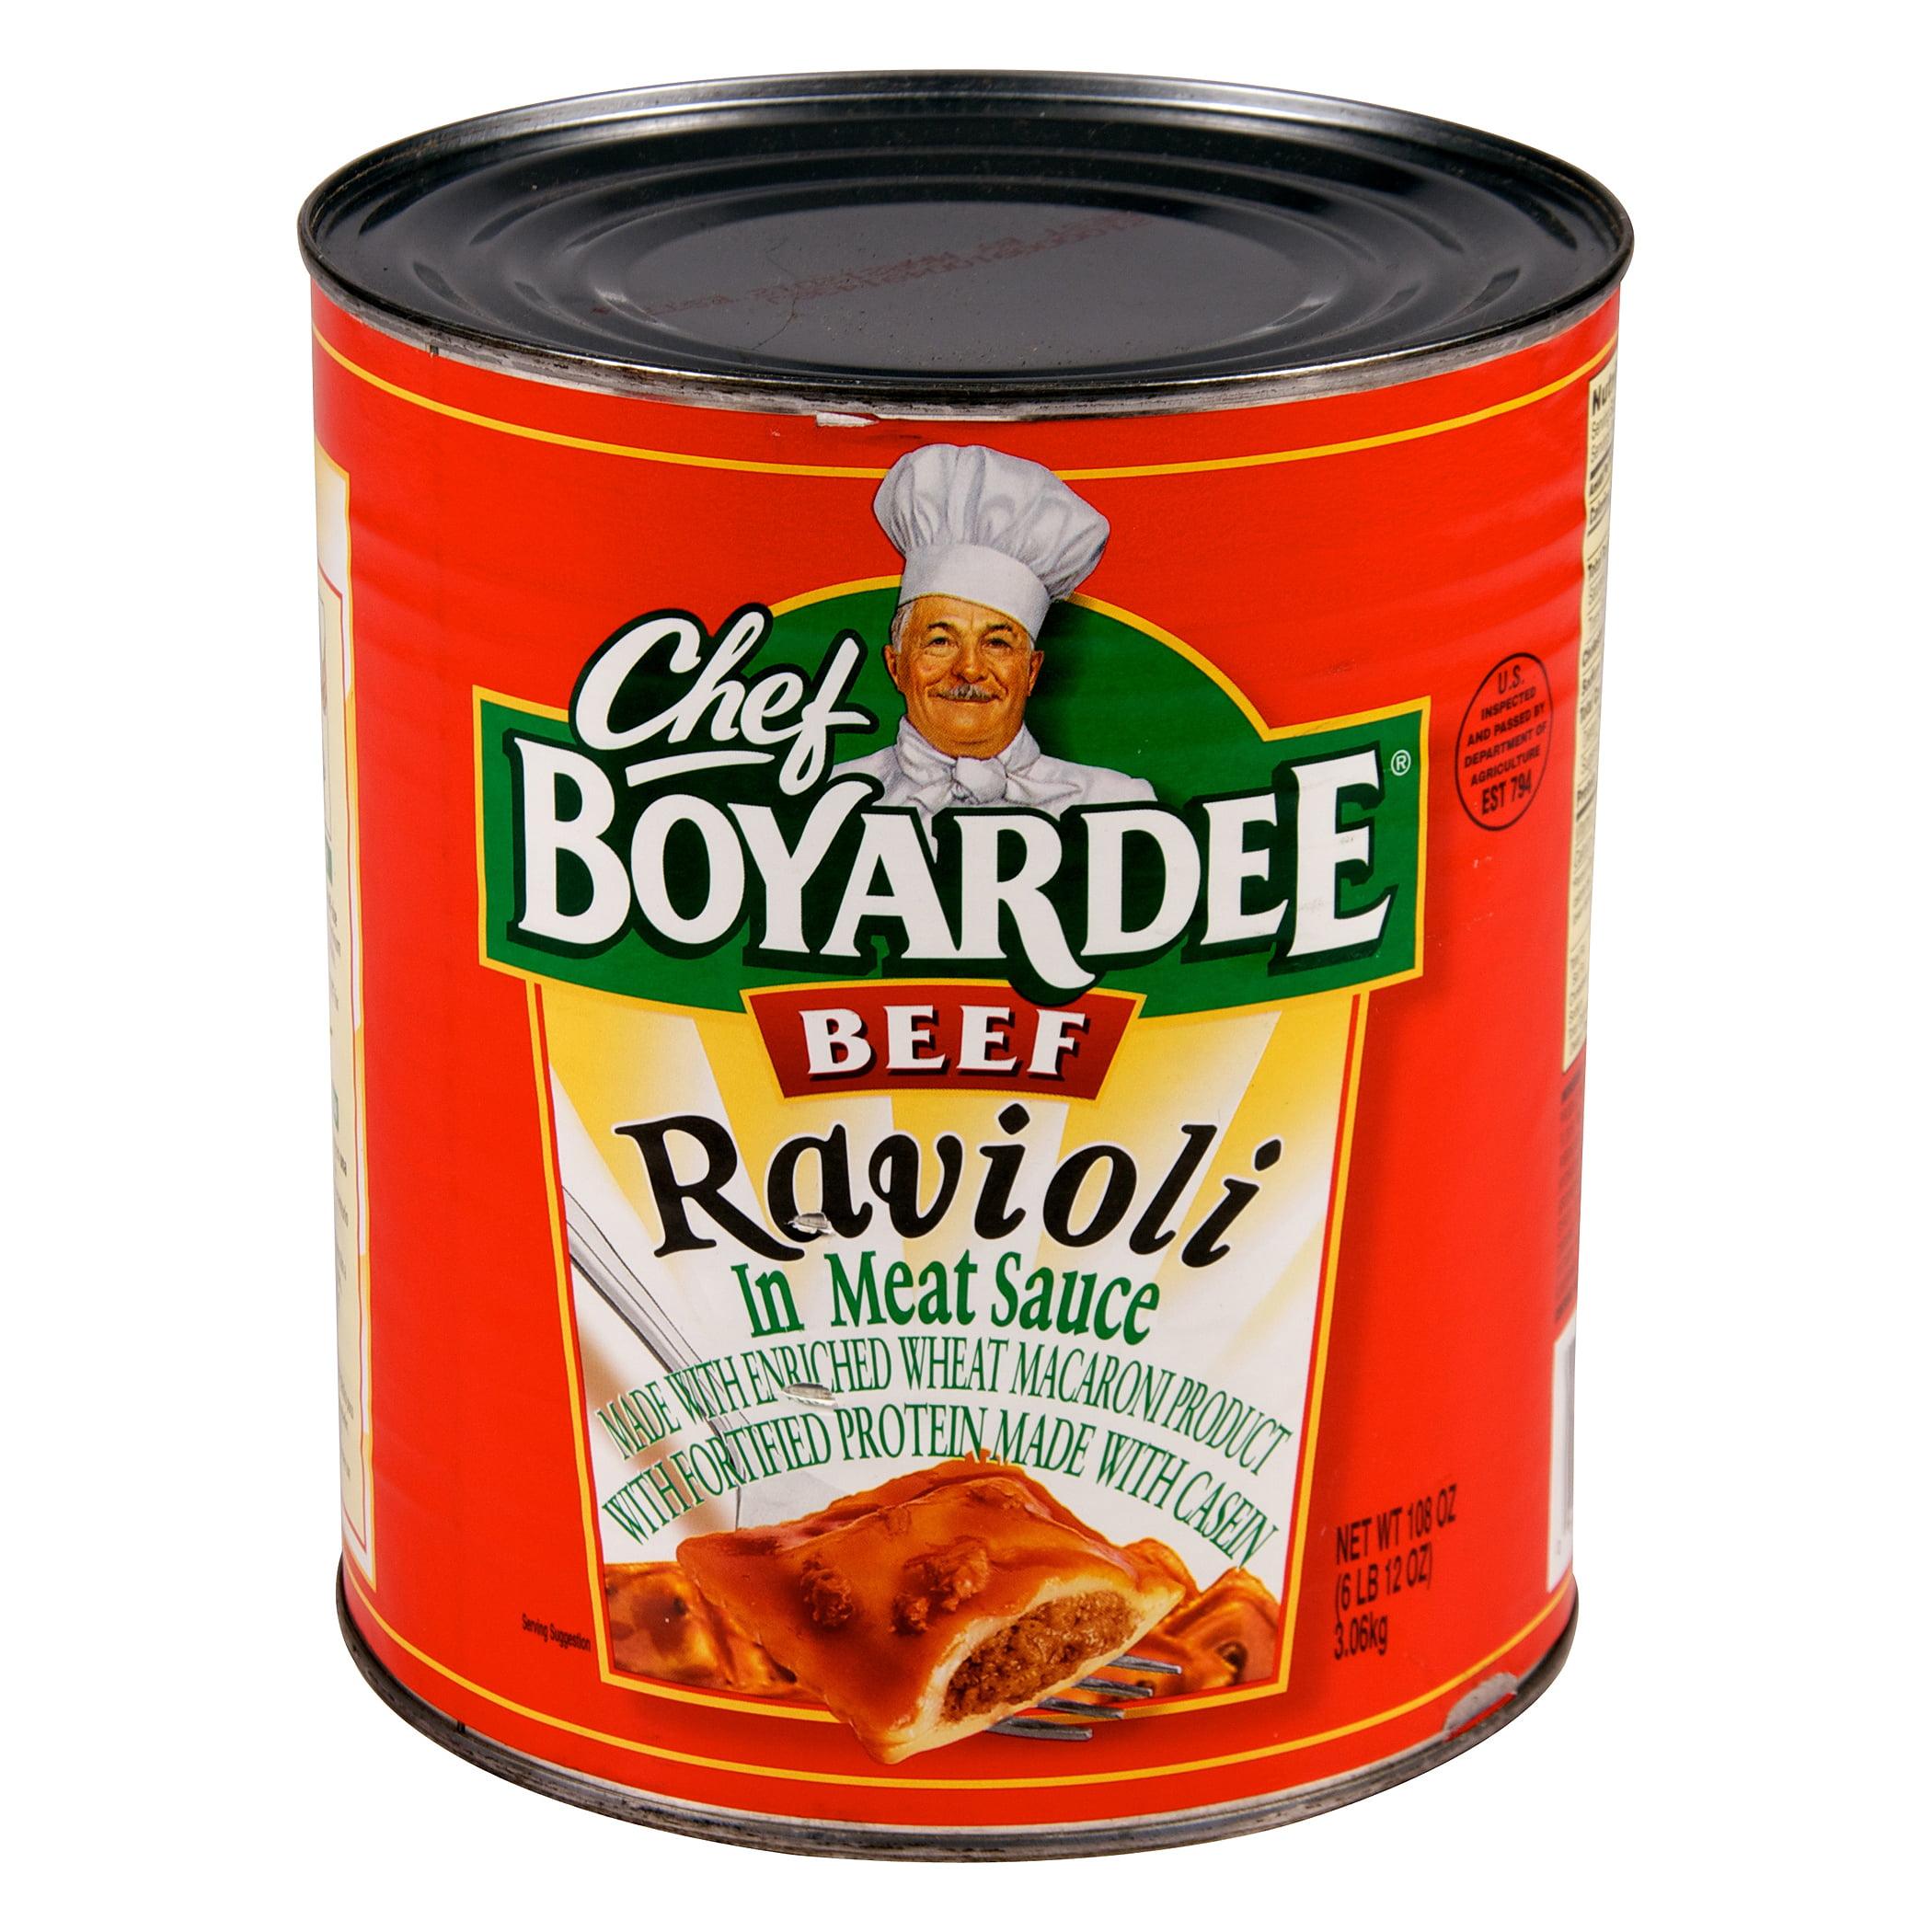 Chef Boyardee In Tomato & Meat Sauce Beef Ravioli, 108 oz